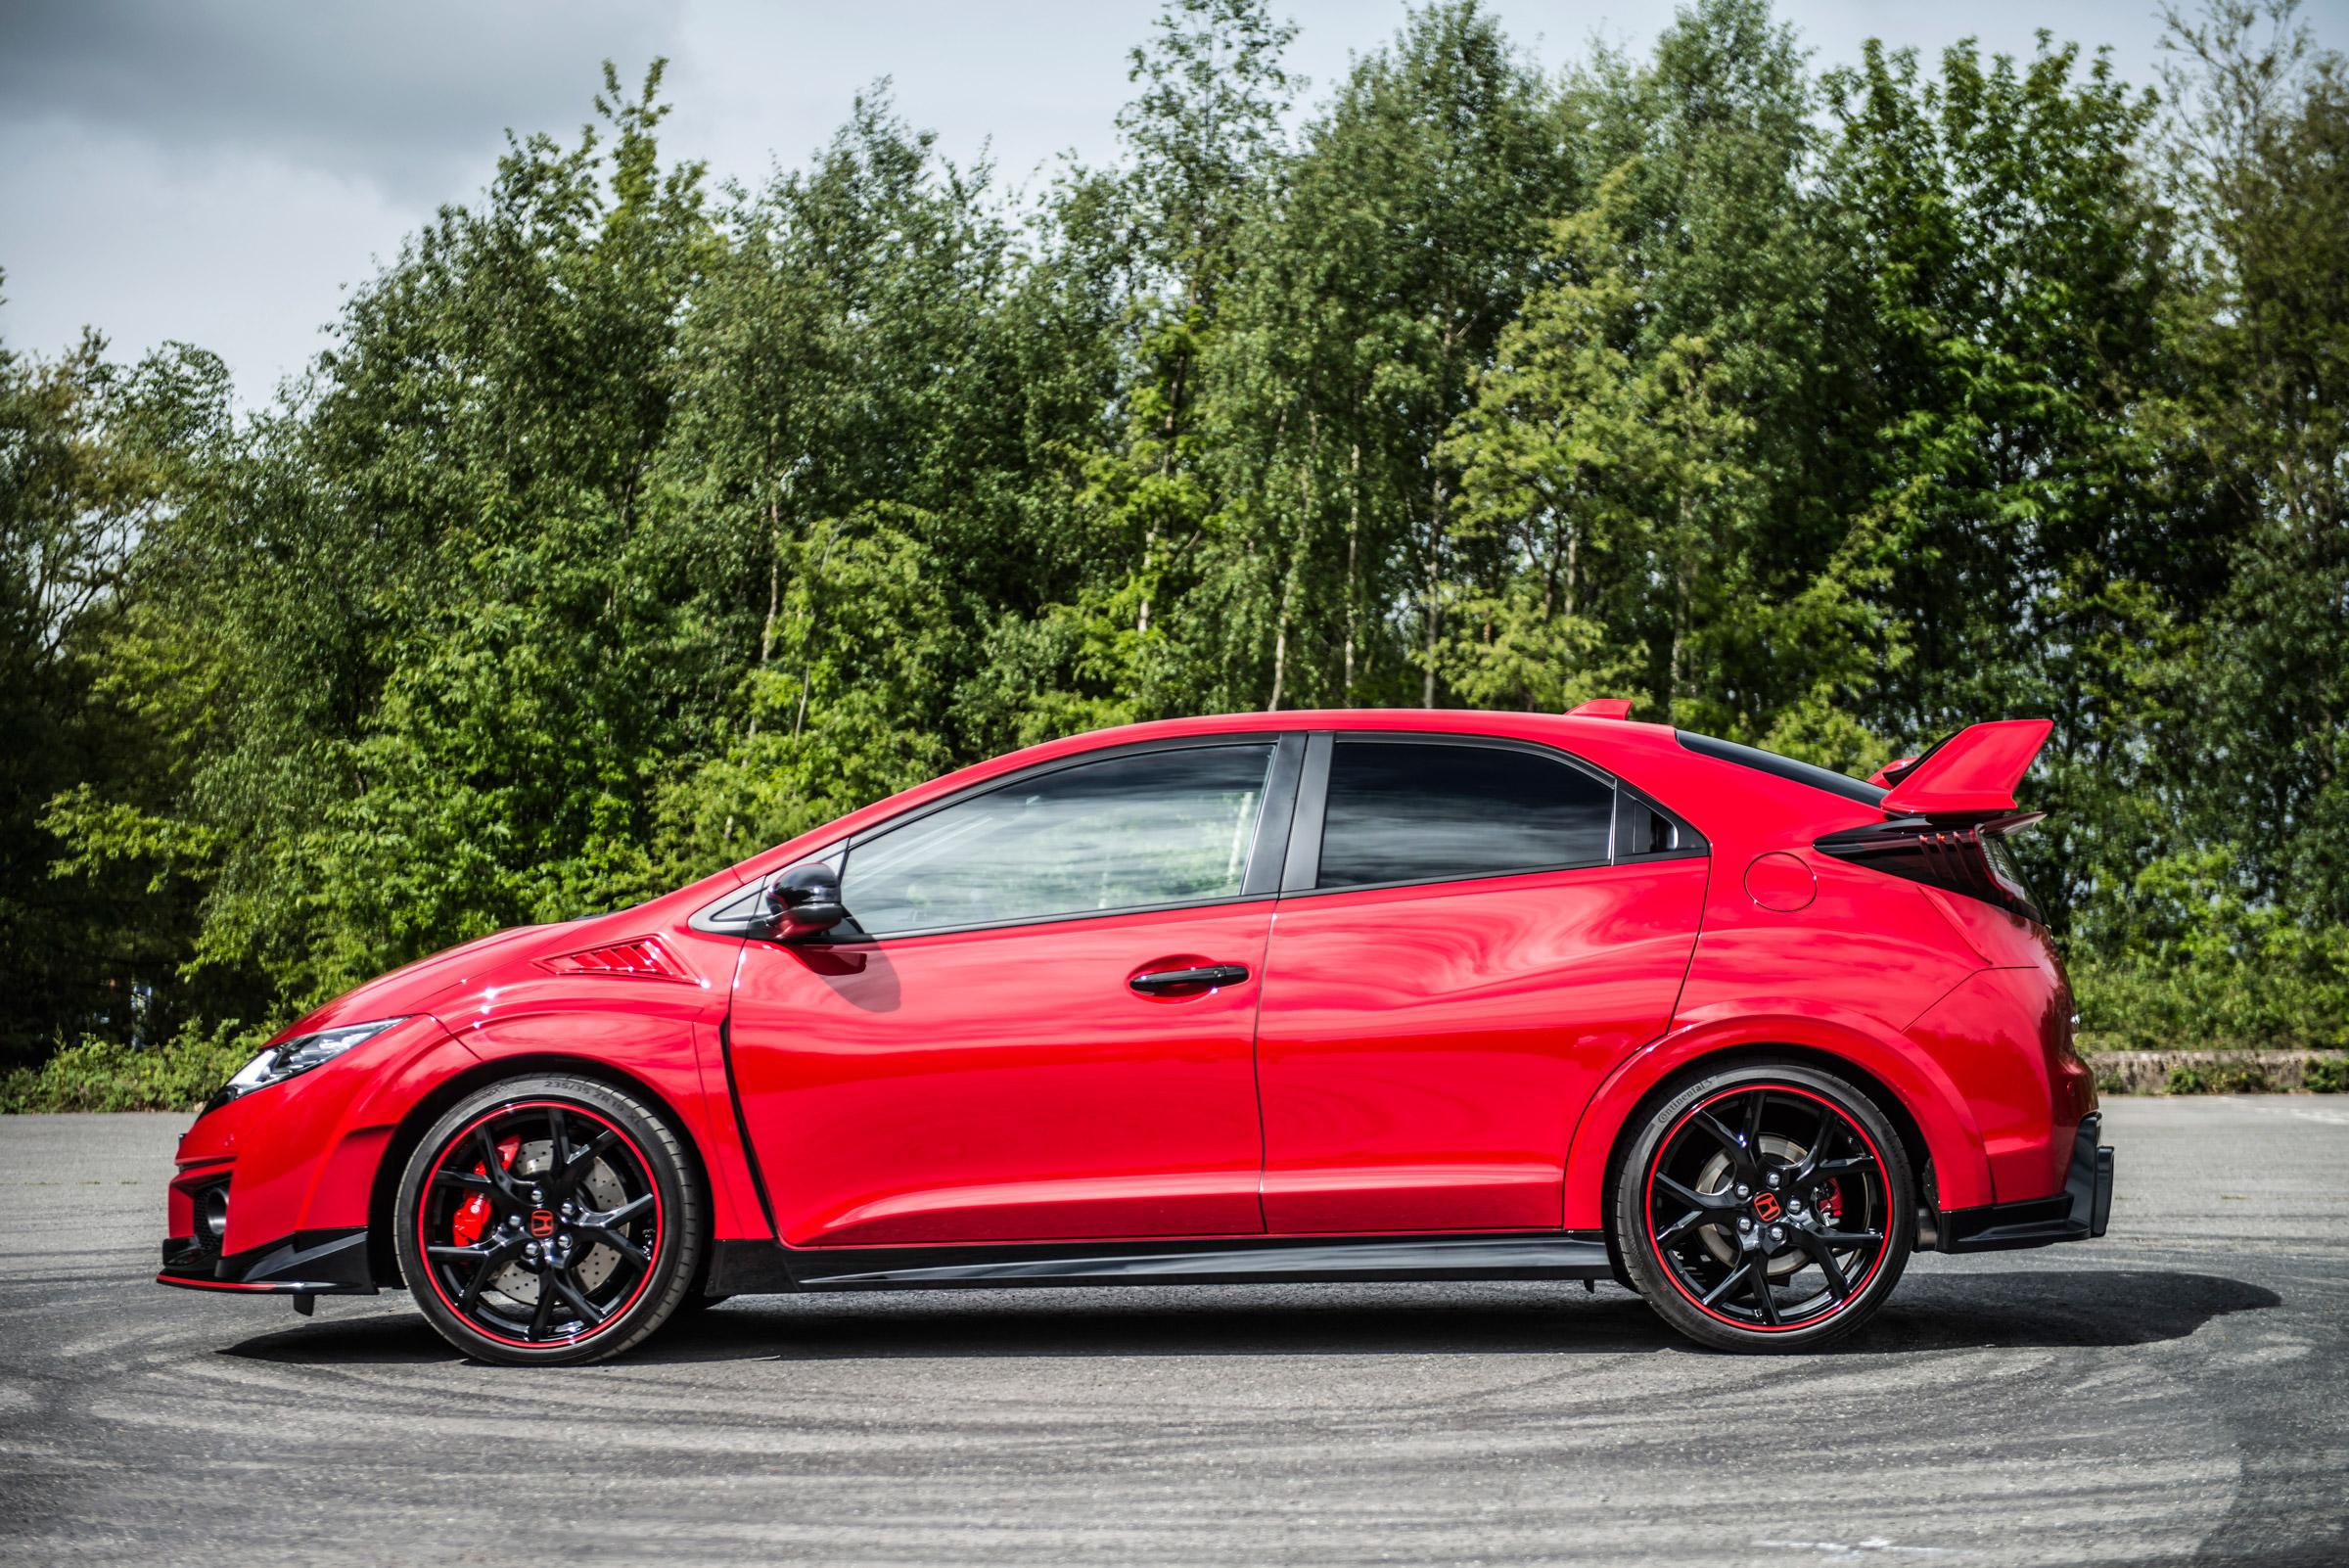 Civic Type R Red RHD HD Wallpaper 6245 2400x1602